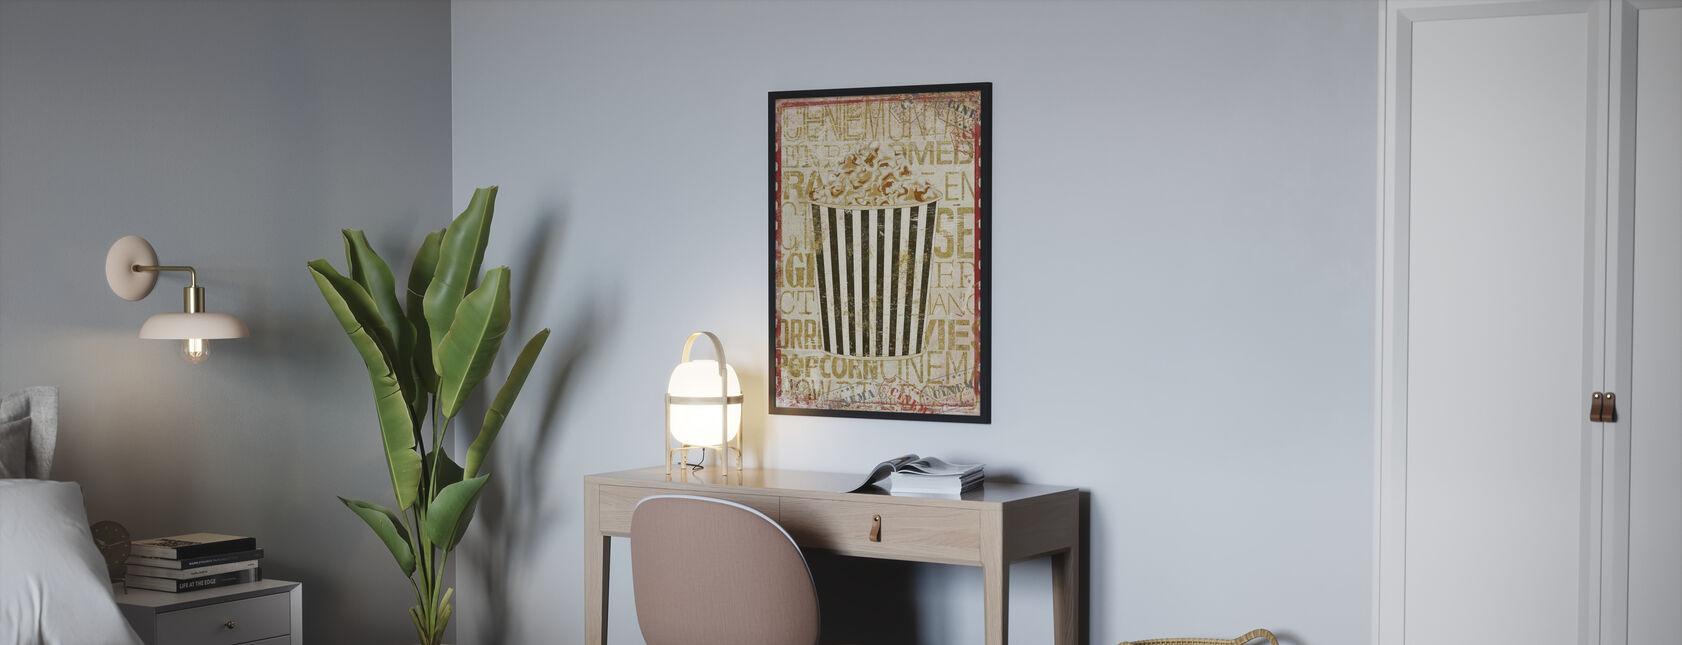 Cinema Popcorn - Poster - Bedroom